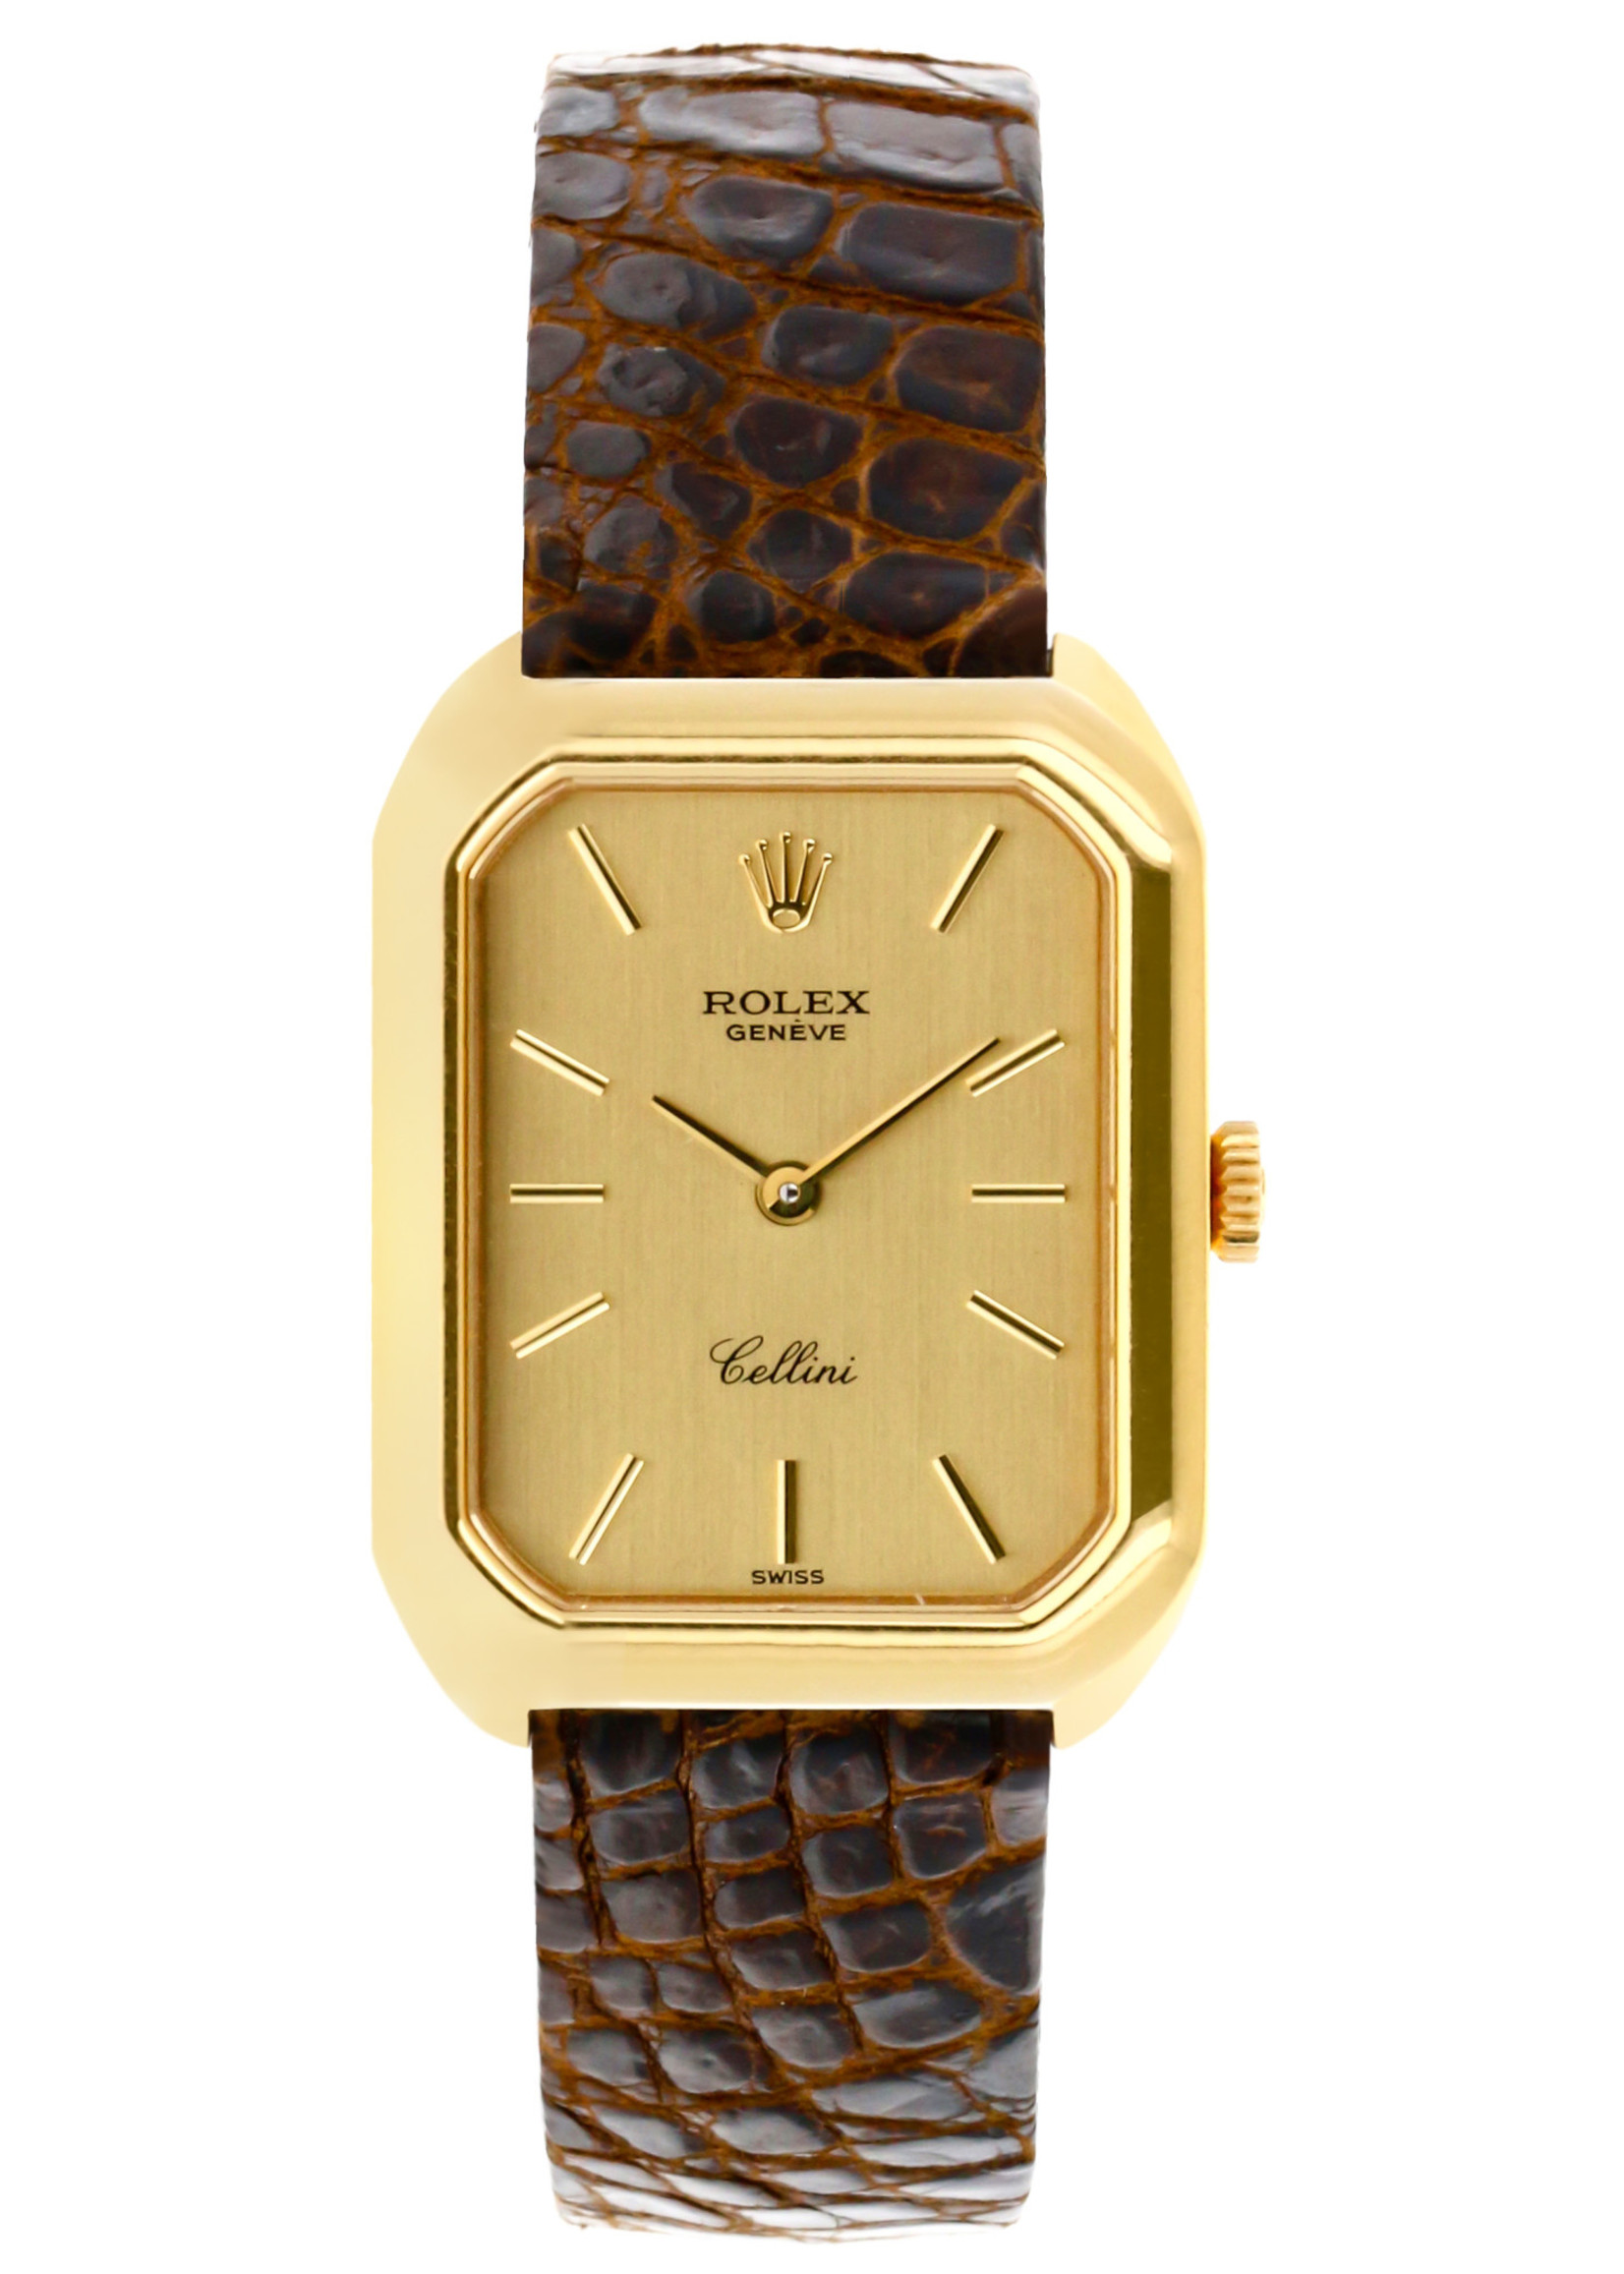 Rolex Watches ROLEX CELLINI 18K GOLD 23MM (1976 B+P) #4104